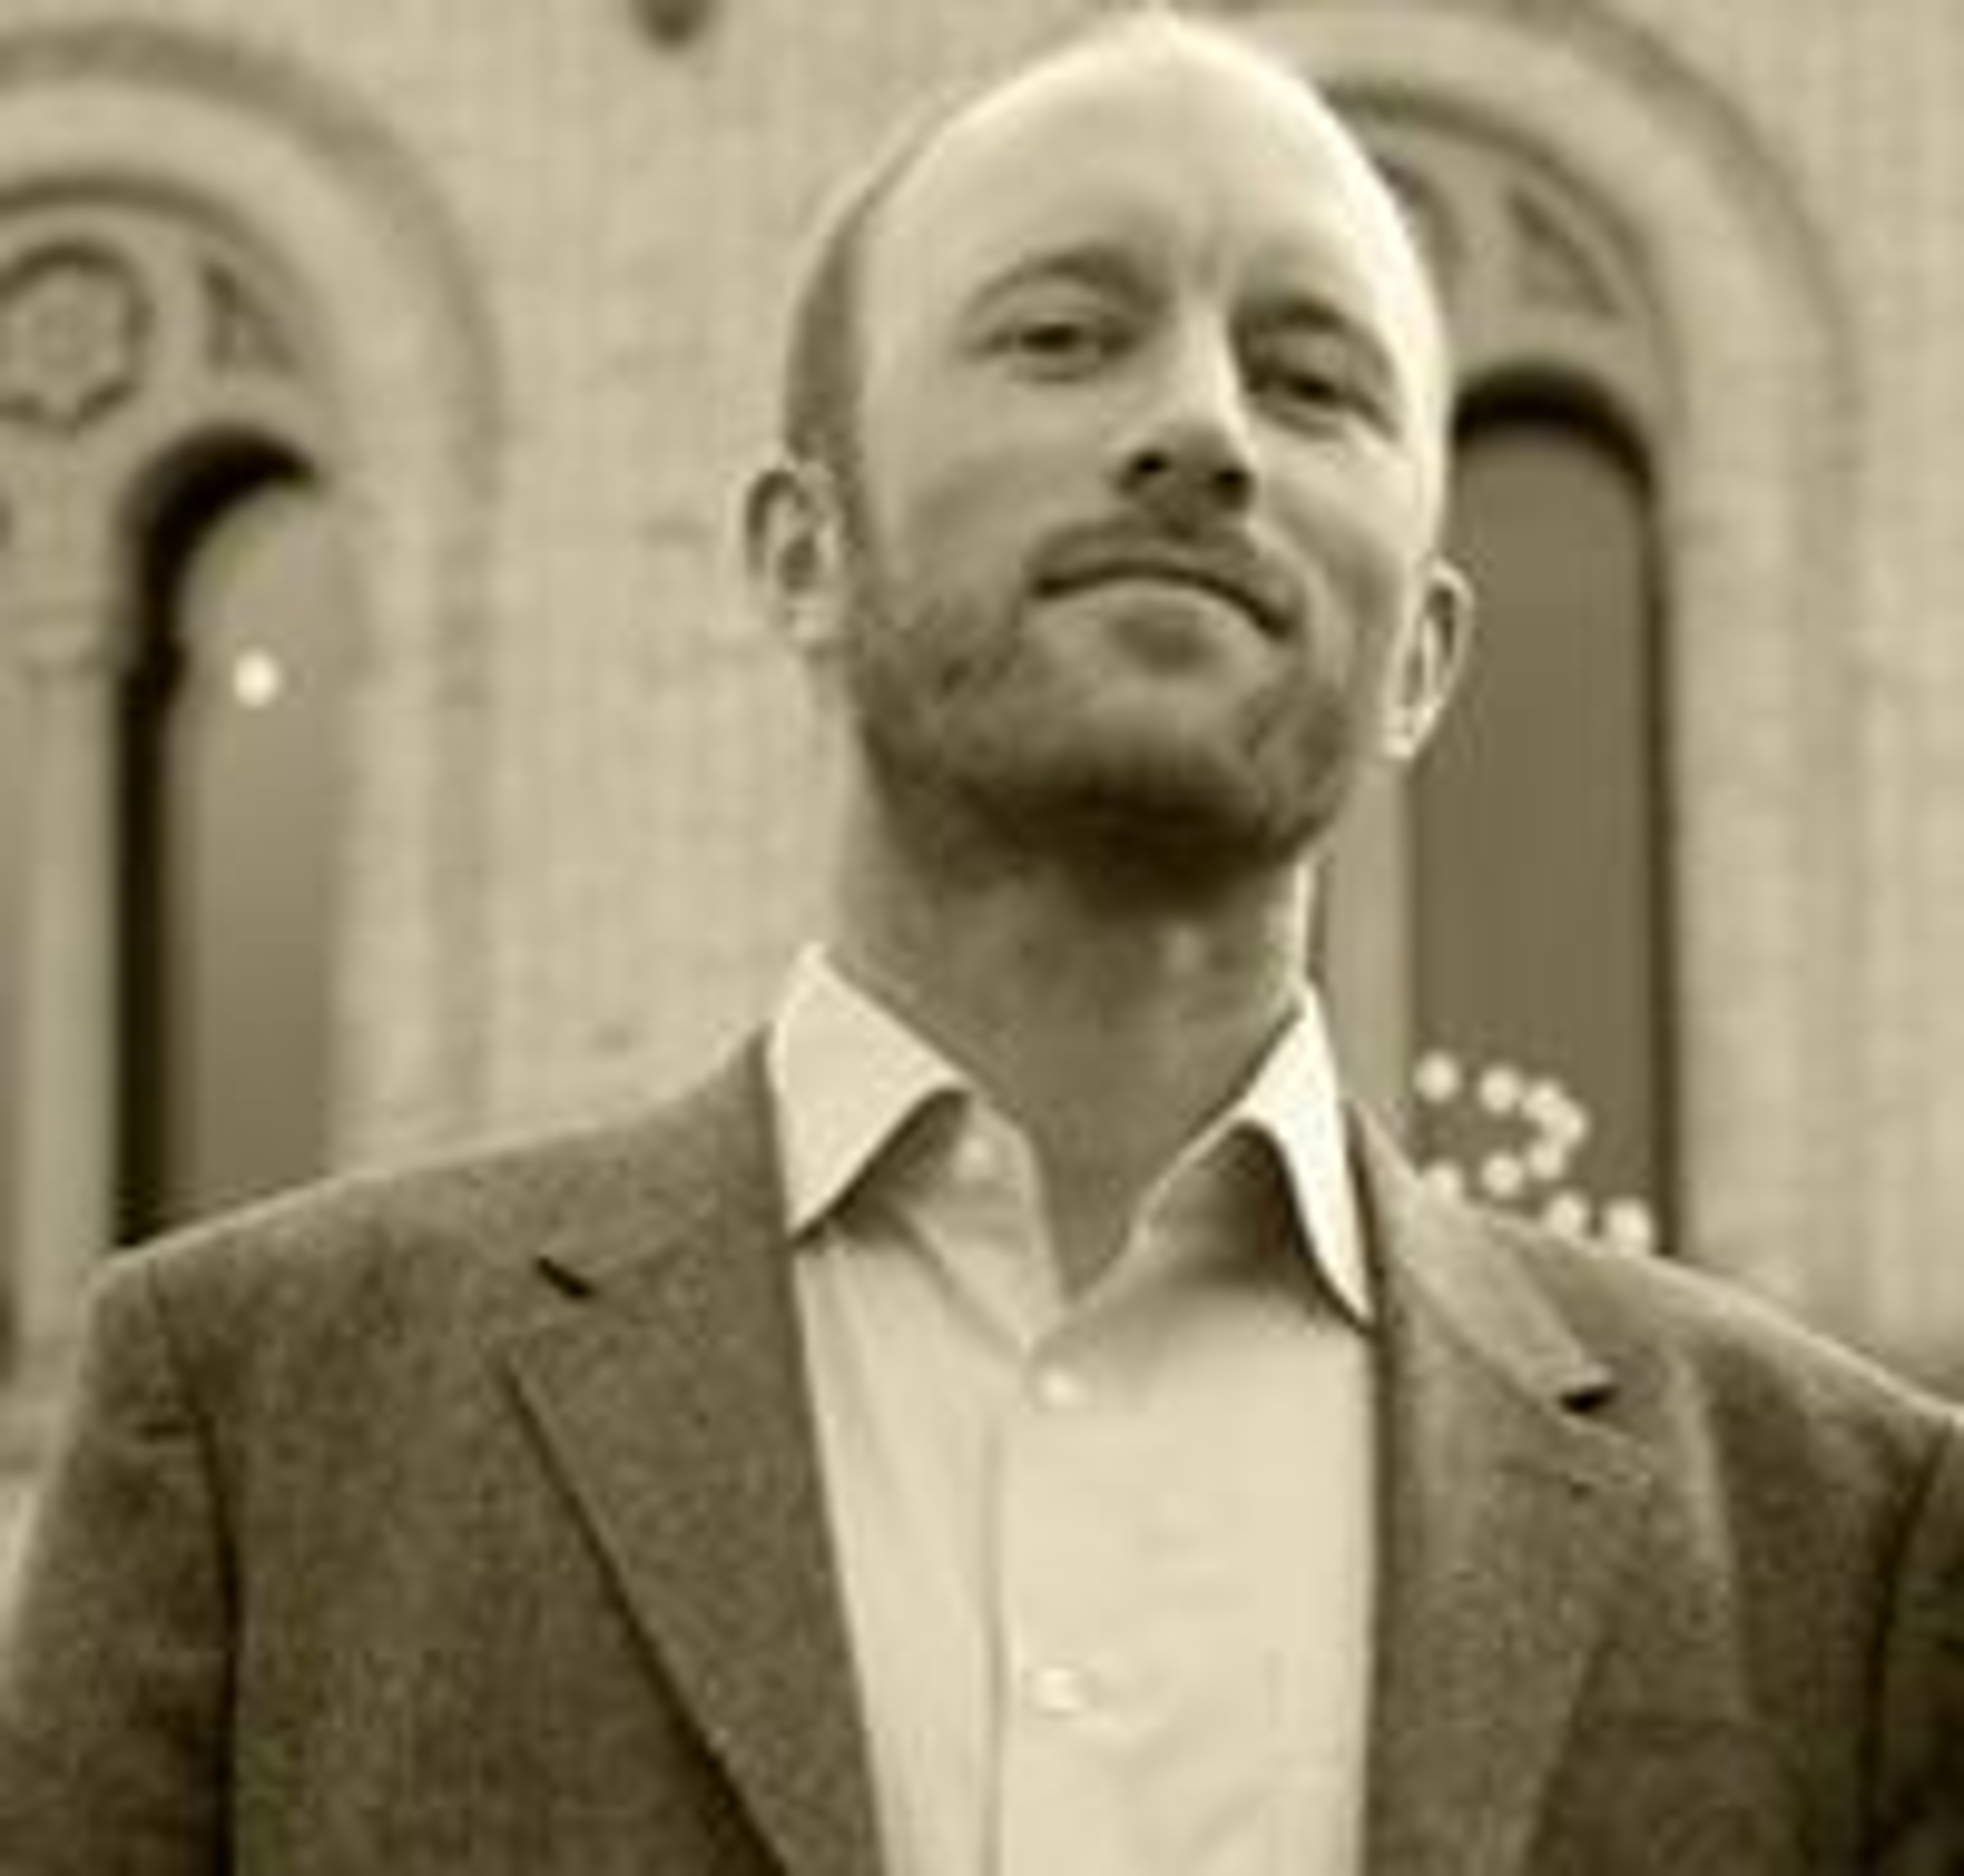 Nils Broström er ansatt som ny kommunikasjonssjef i Opera Software.